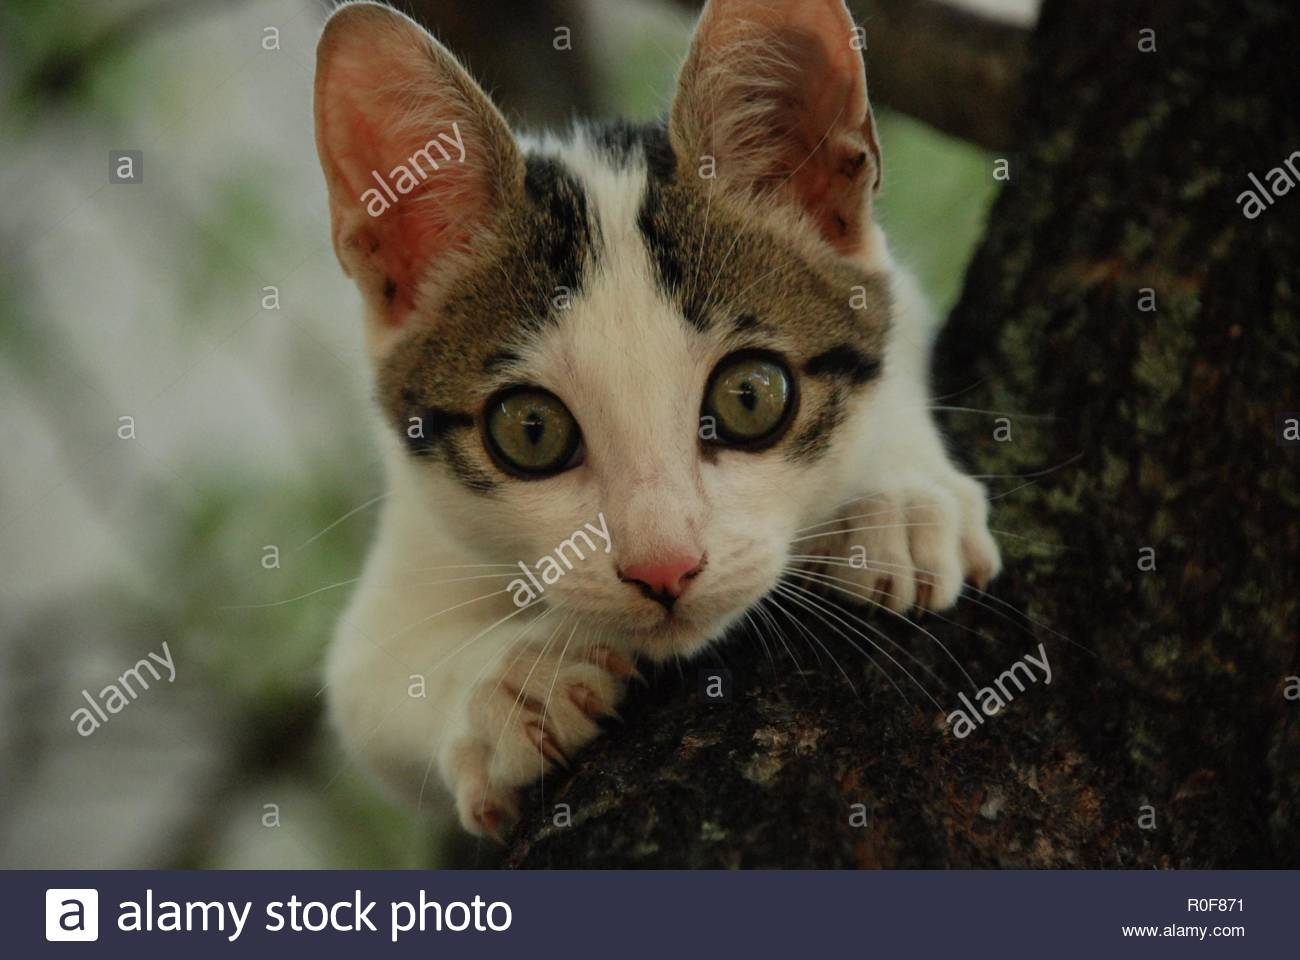 Kitten in tree - Stock Image